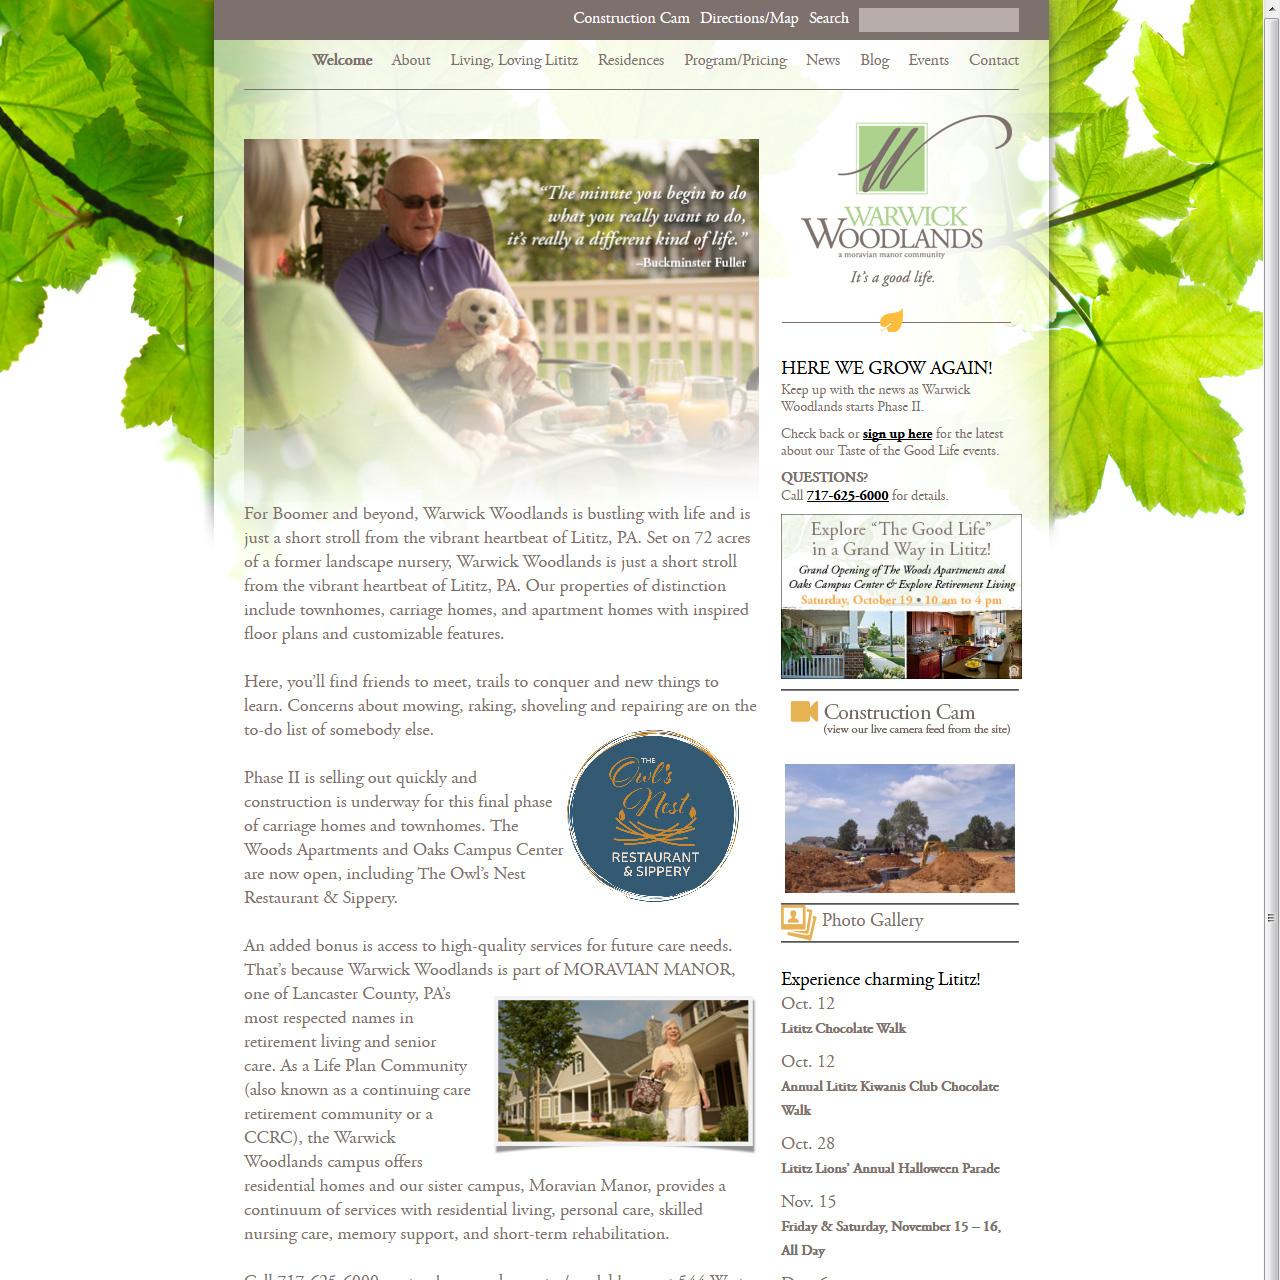 Warwick Woodlands Retirement Community - 55 plus community website design